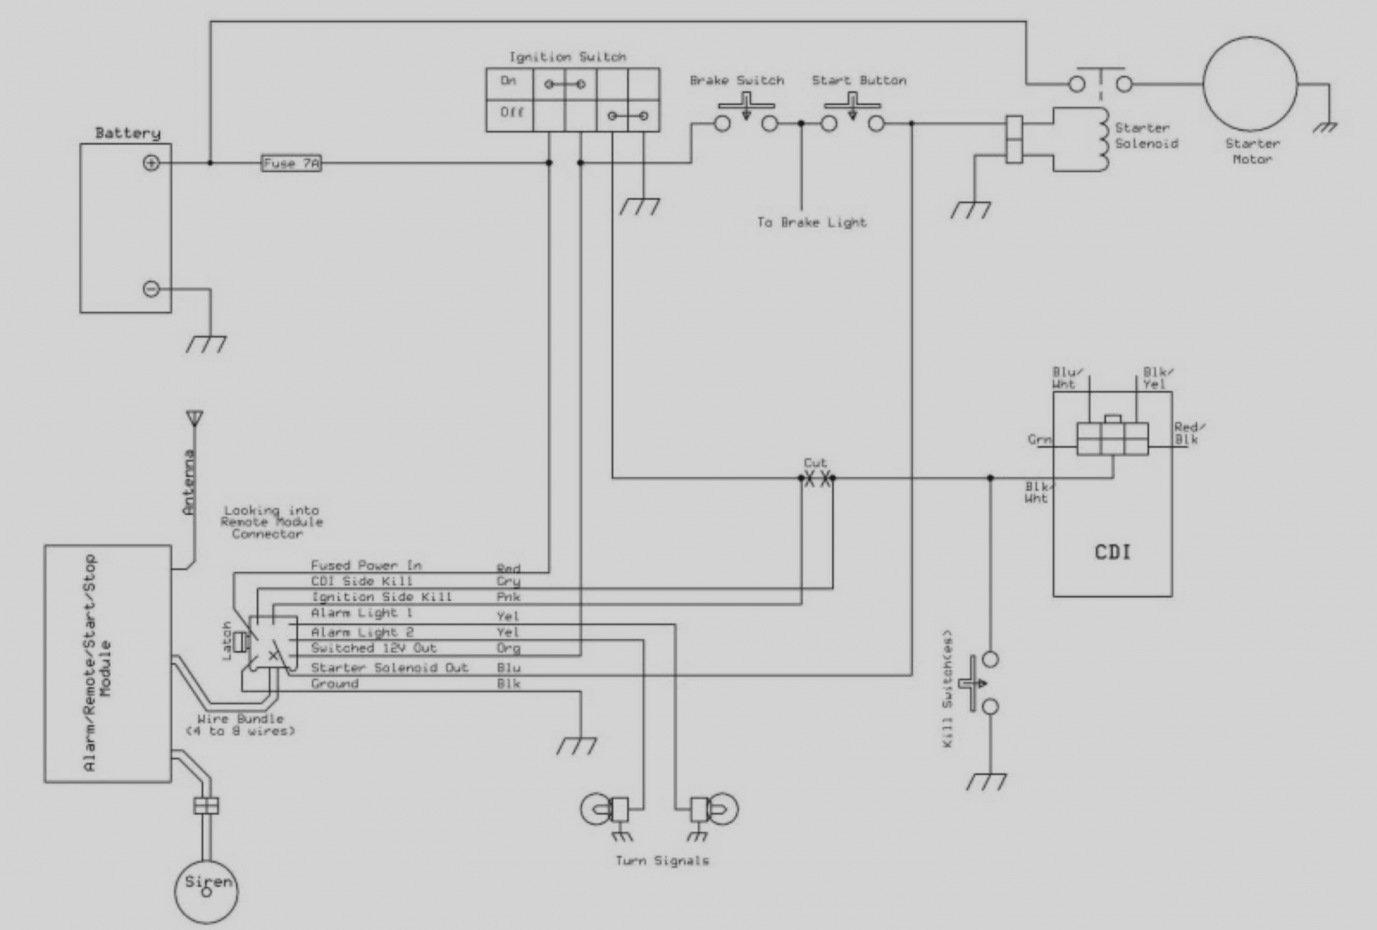 hight resolution of atv starter wiring diagram wiring diagram atv starter solenoid wiring diagram